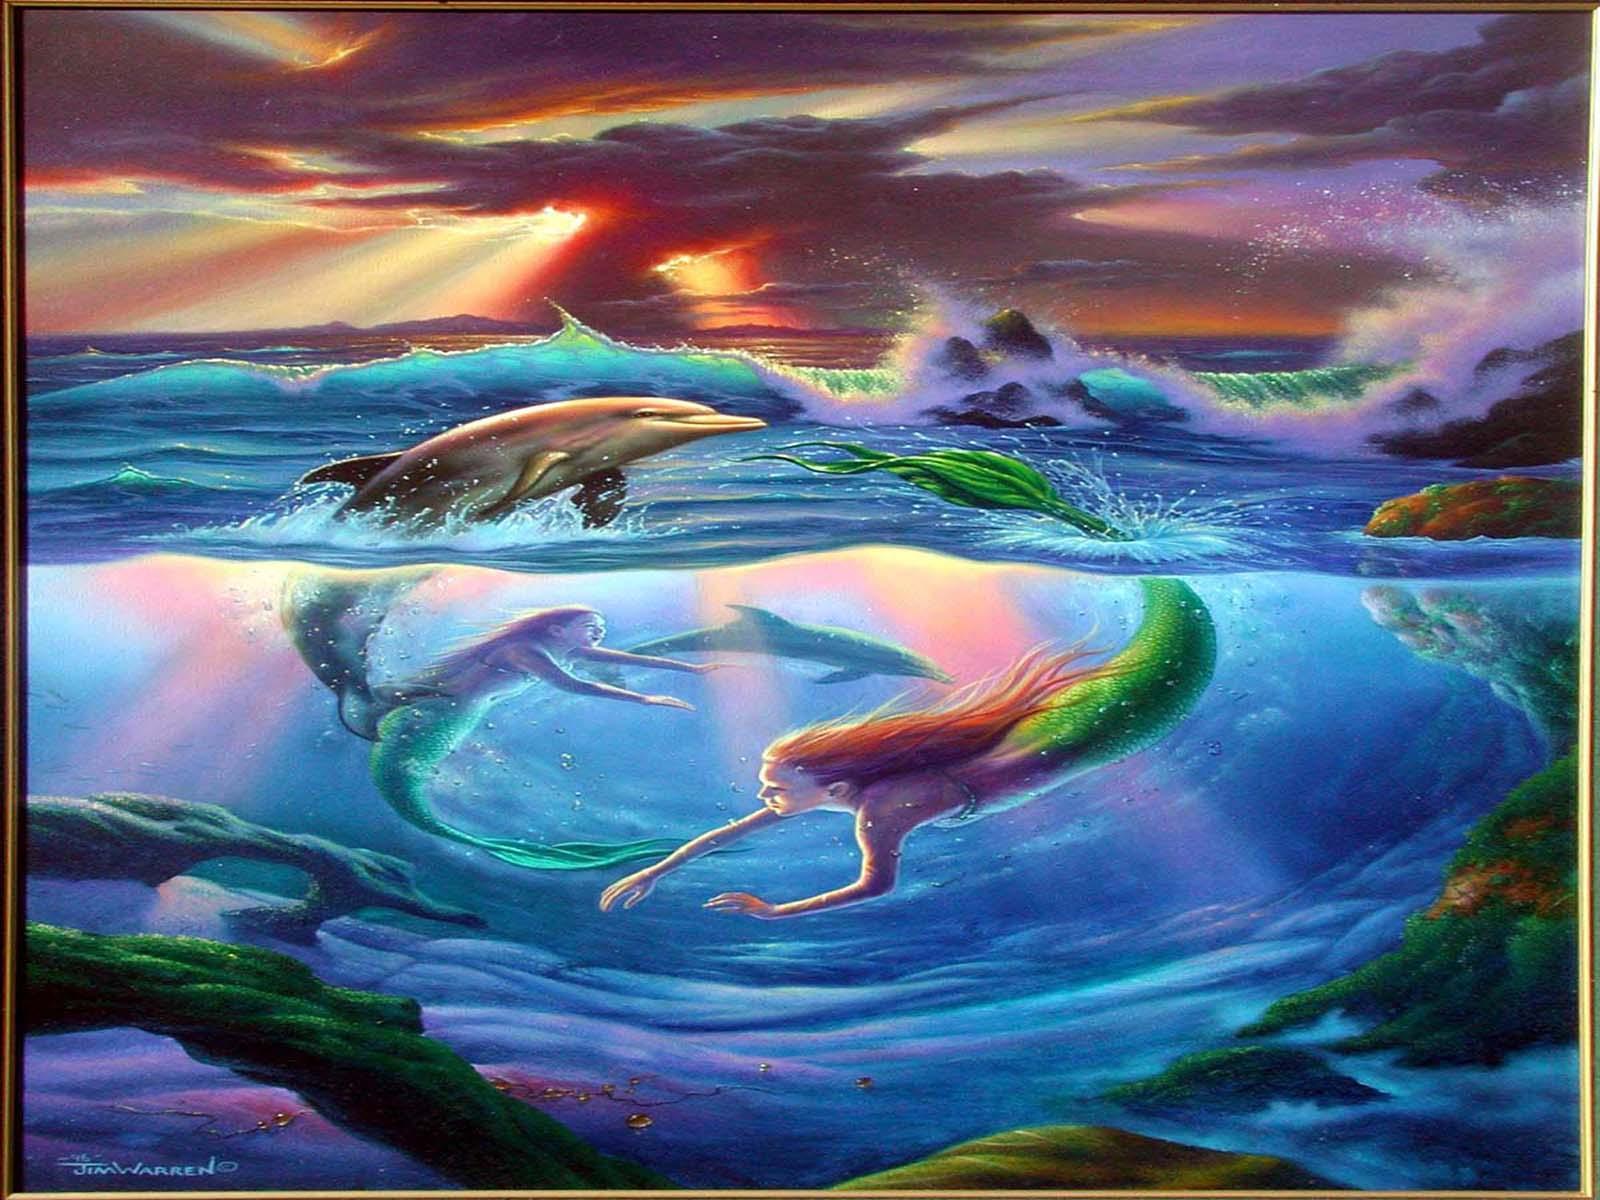 fantasy wallpapers for desktop | hd wallpapers pulse